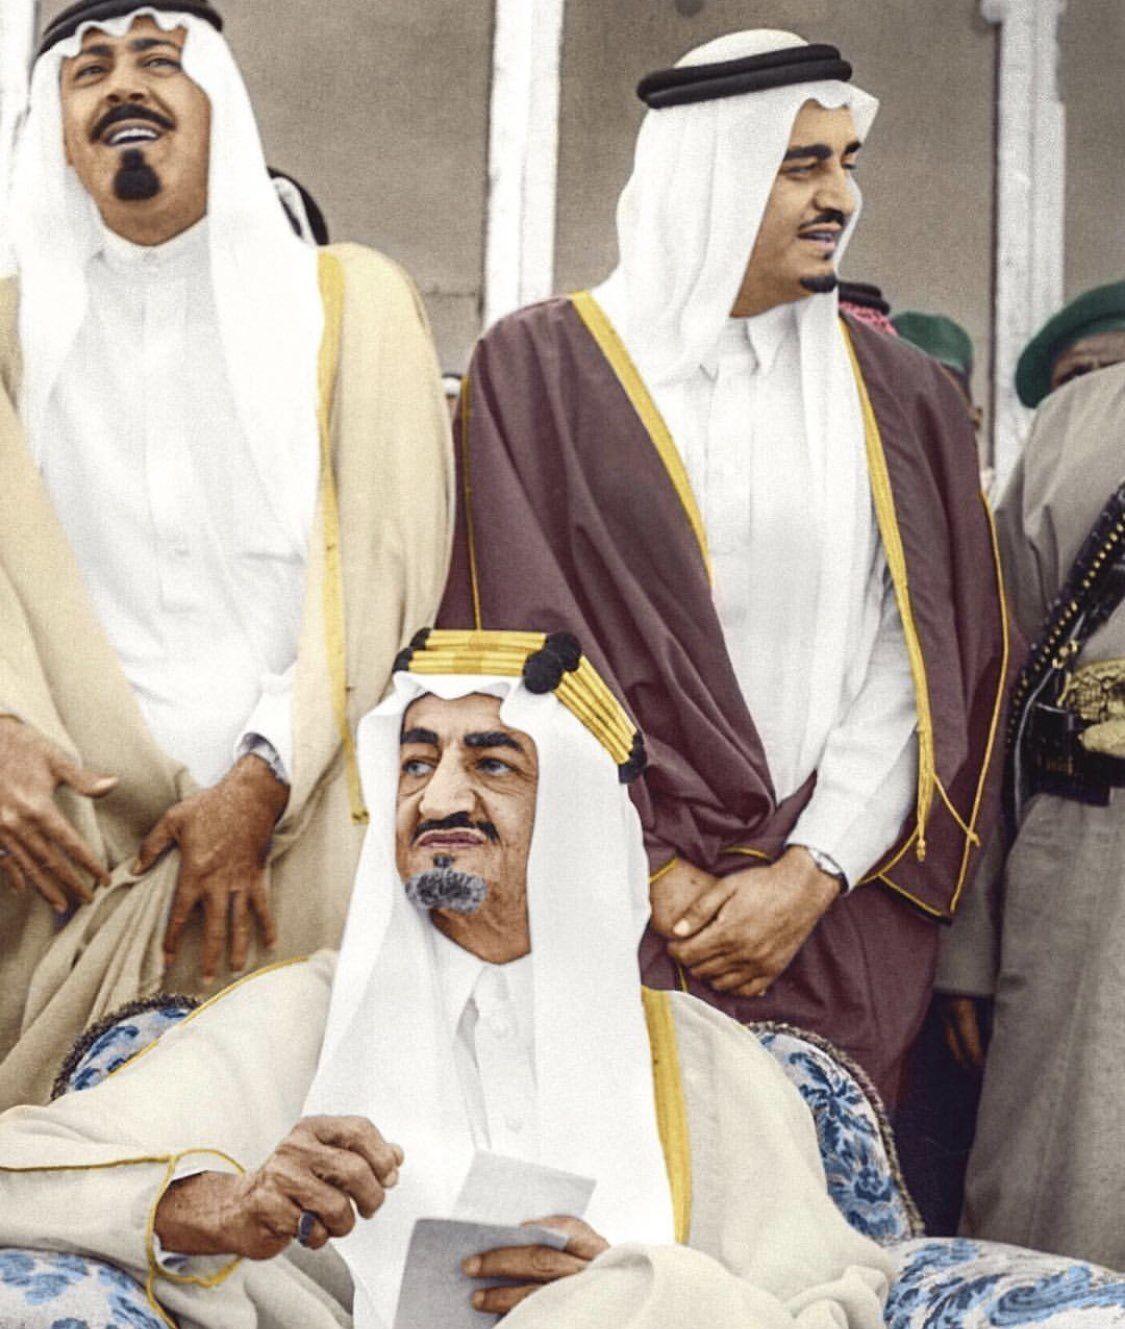 Pin By Othman Amri On إنتماء Saudi Arabia Culture King Salman Saudi Arabia Handsome Arab Men